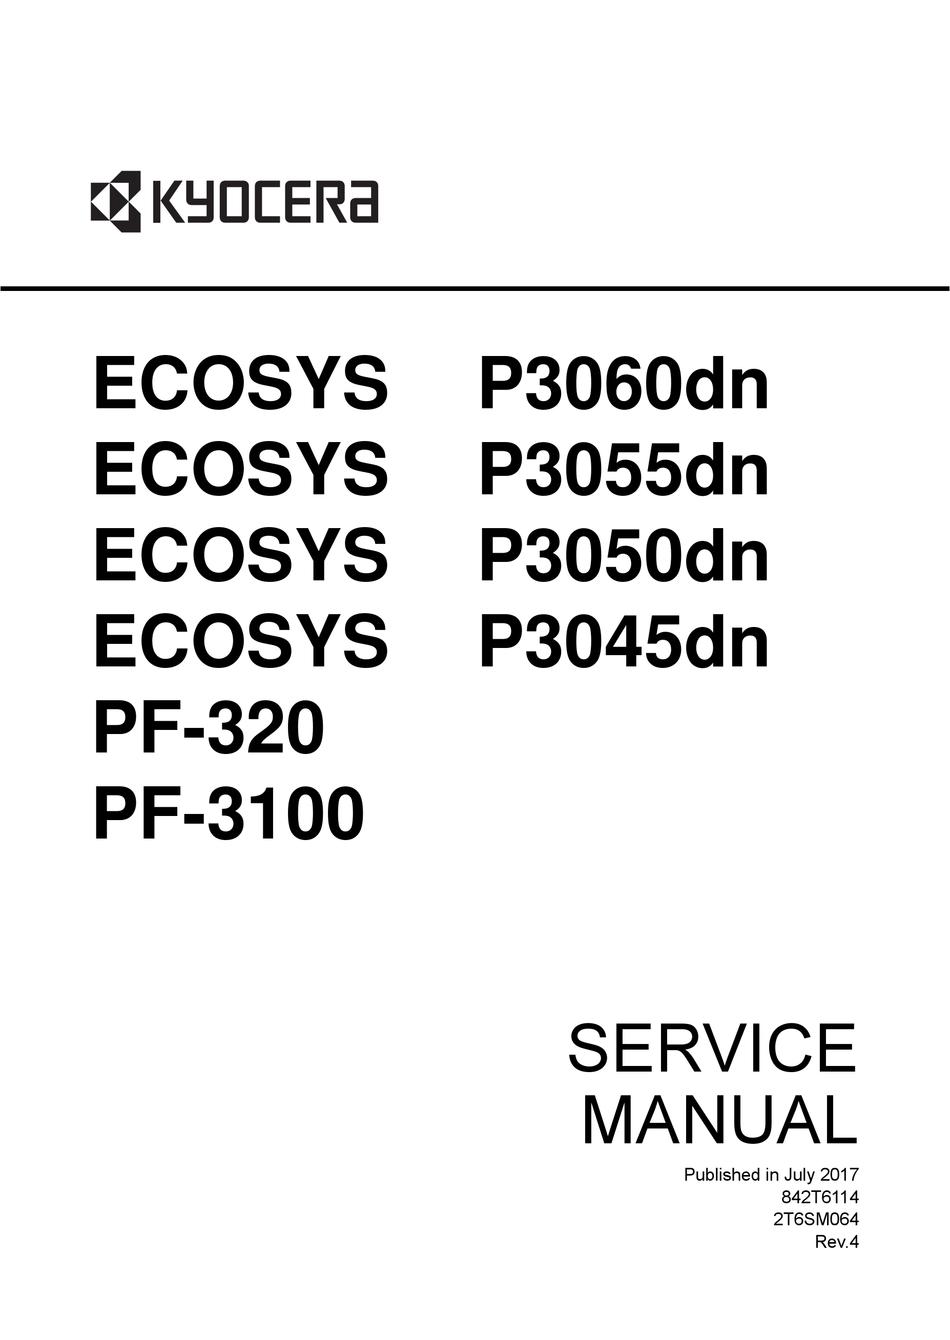 KYOCERA ECOSYS P3060DN SERVICE MANUAL Pdf Download